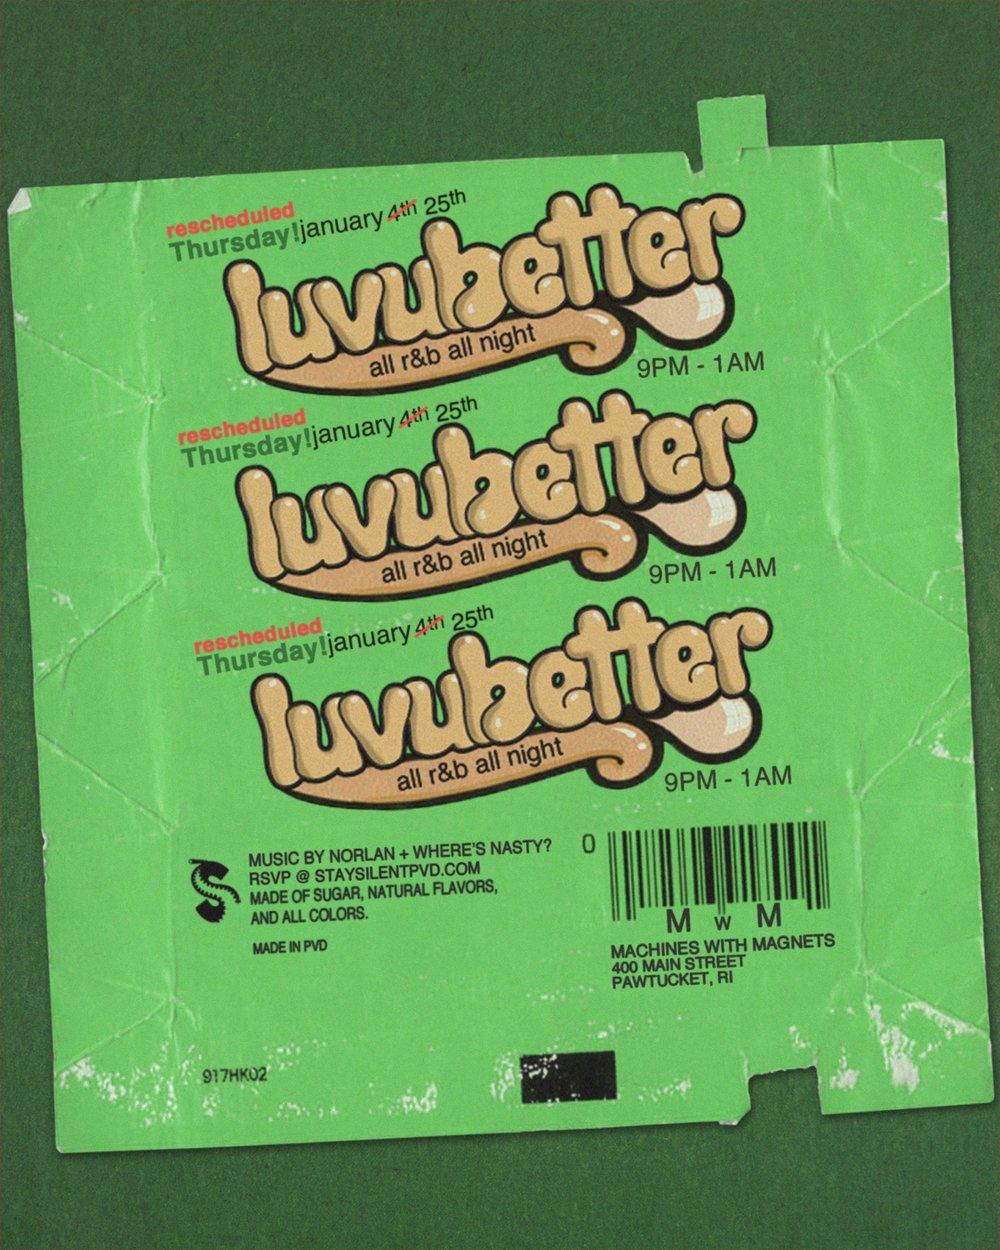 LUVUBETTER-FLYER-JAN.jpg.jpeg